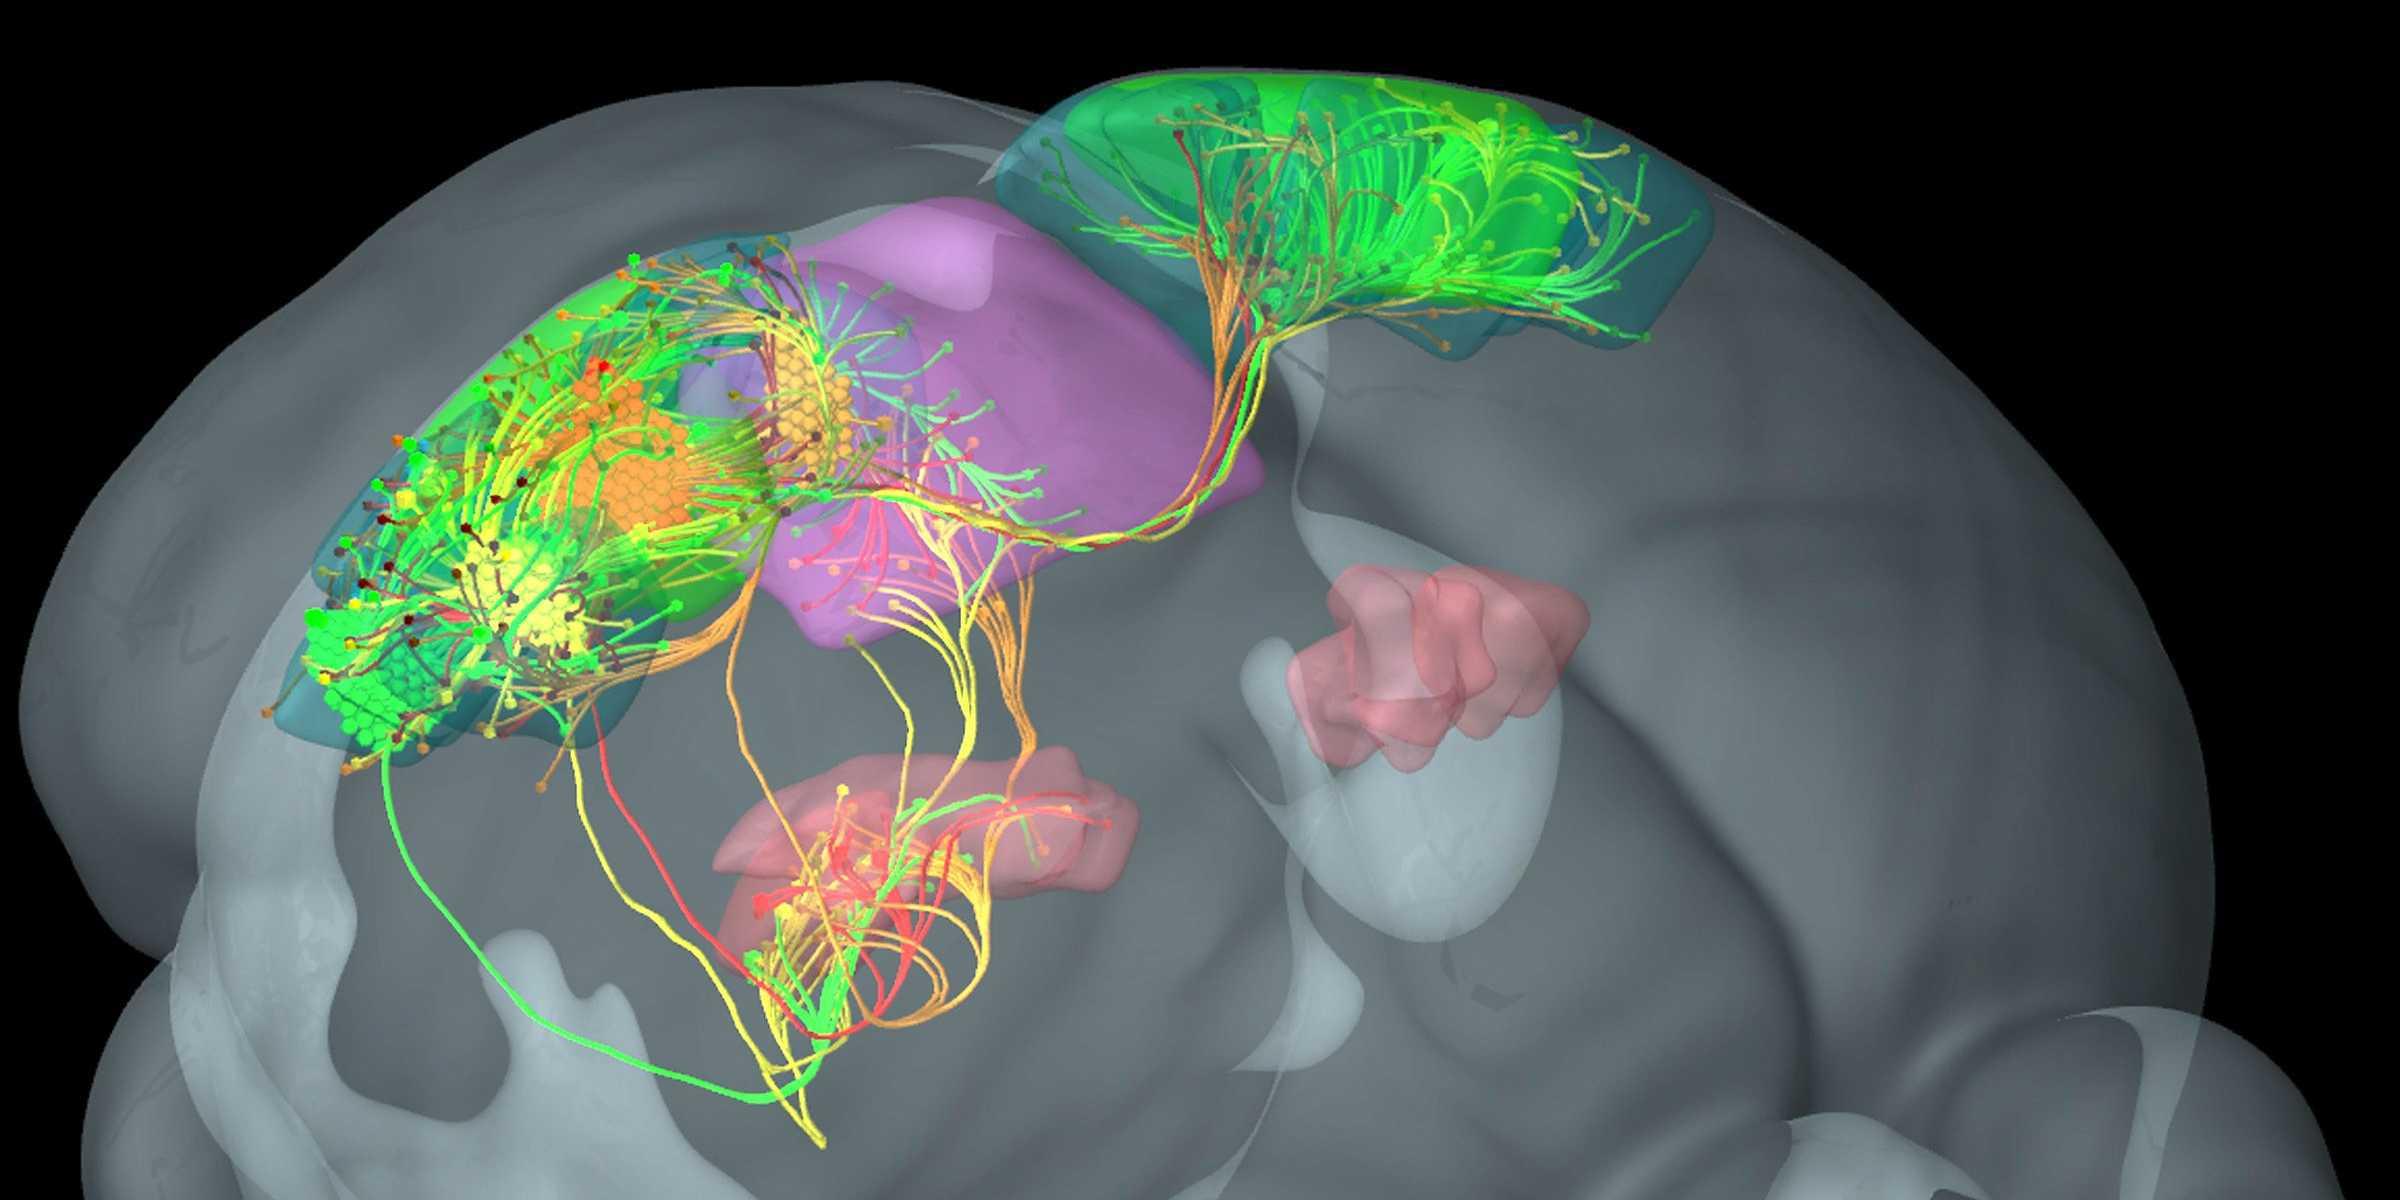 Фото мозг старого человека 5